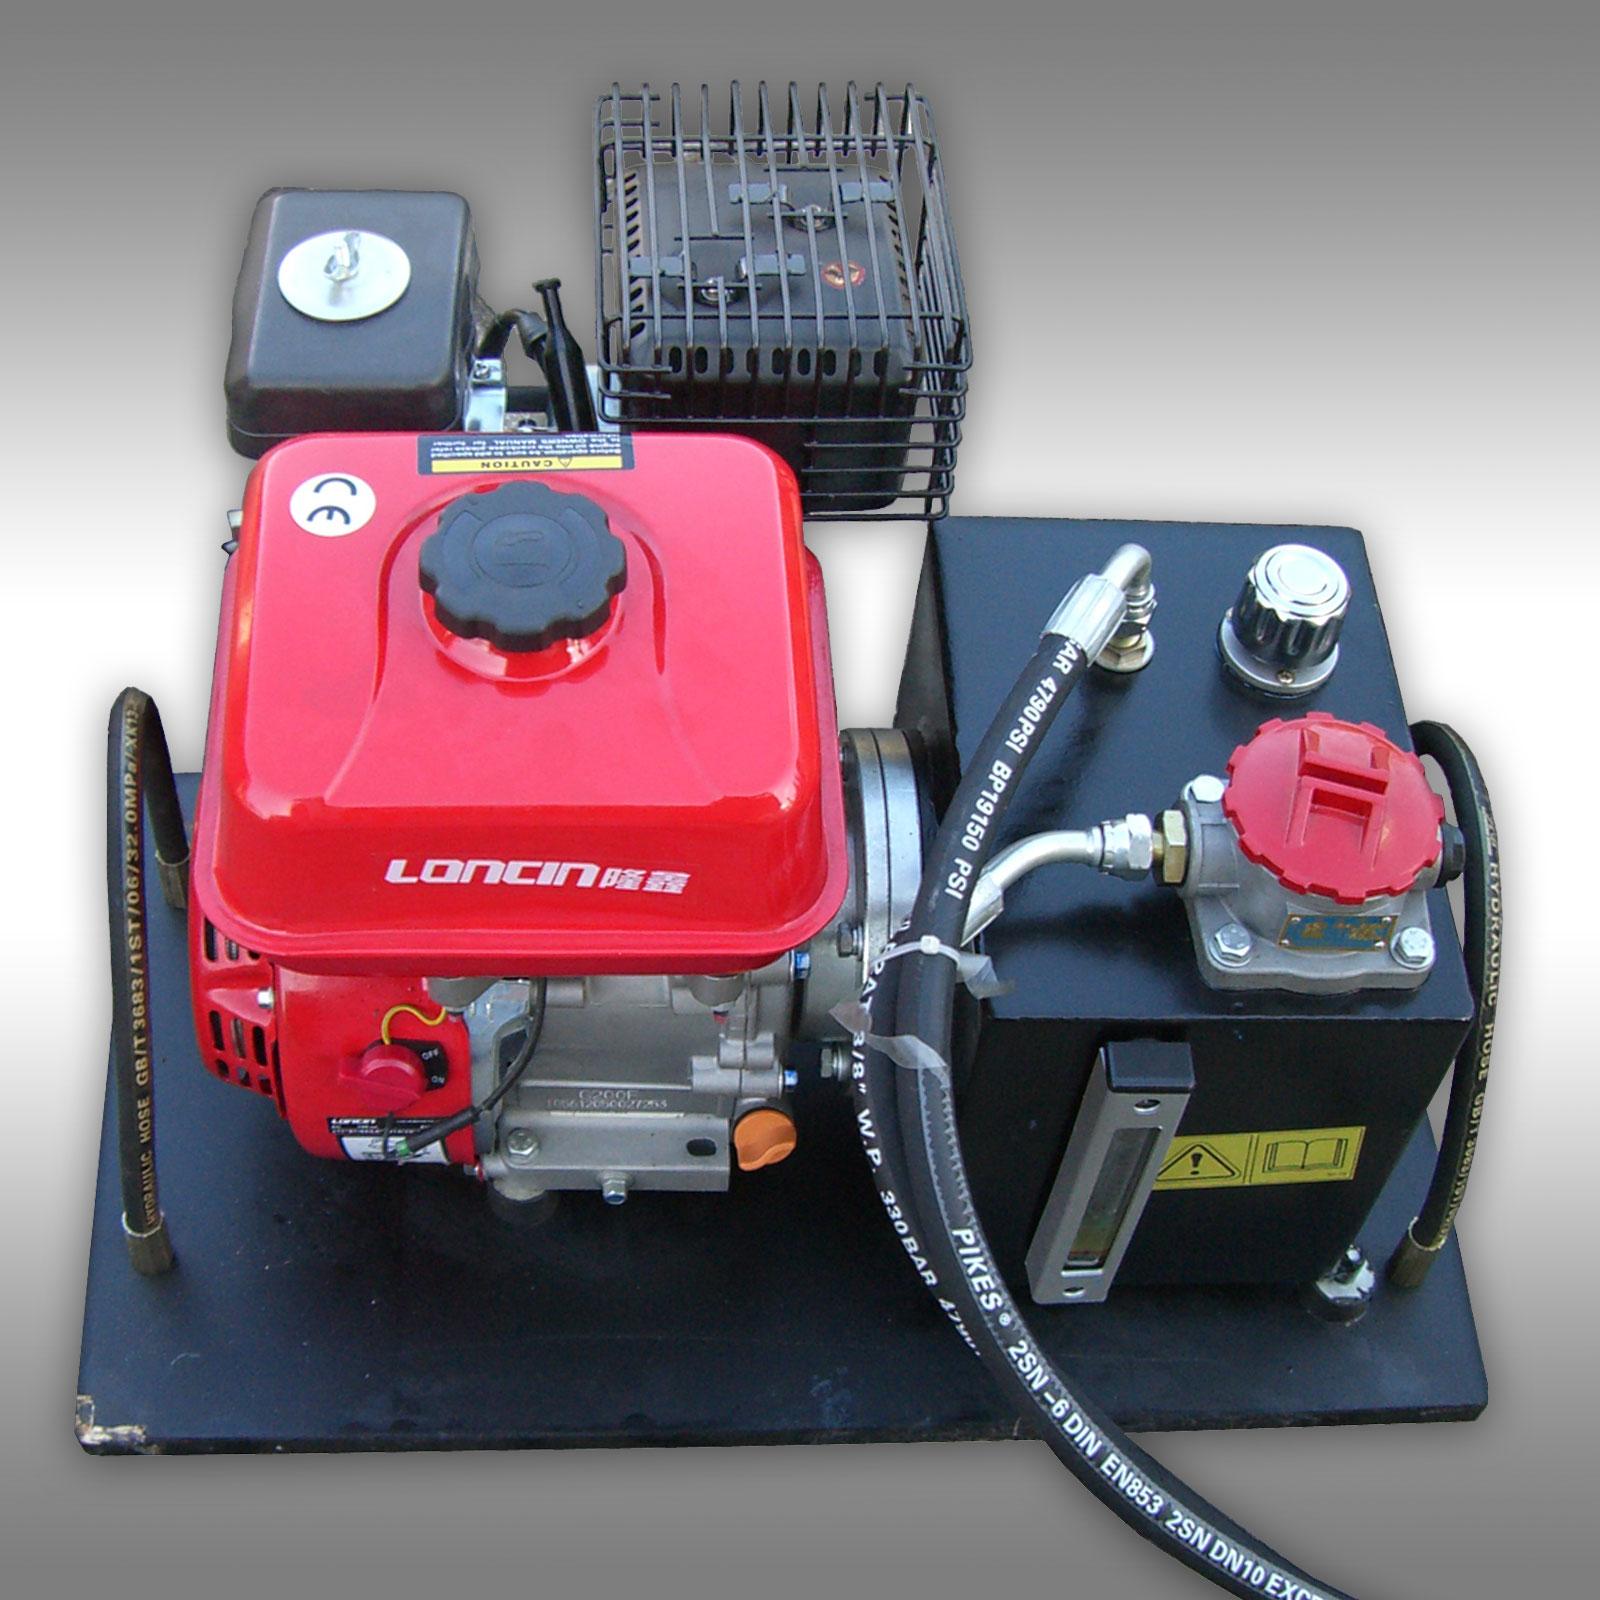 Jansen Hydraulische motorunit voor transportaanhanger  HRW-15, benzinemotor